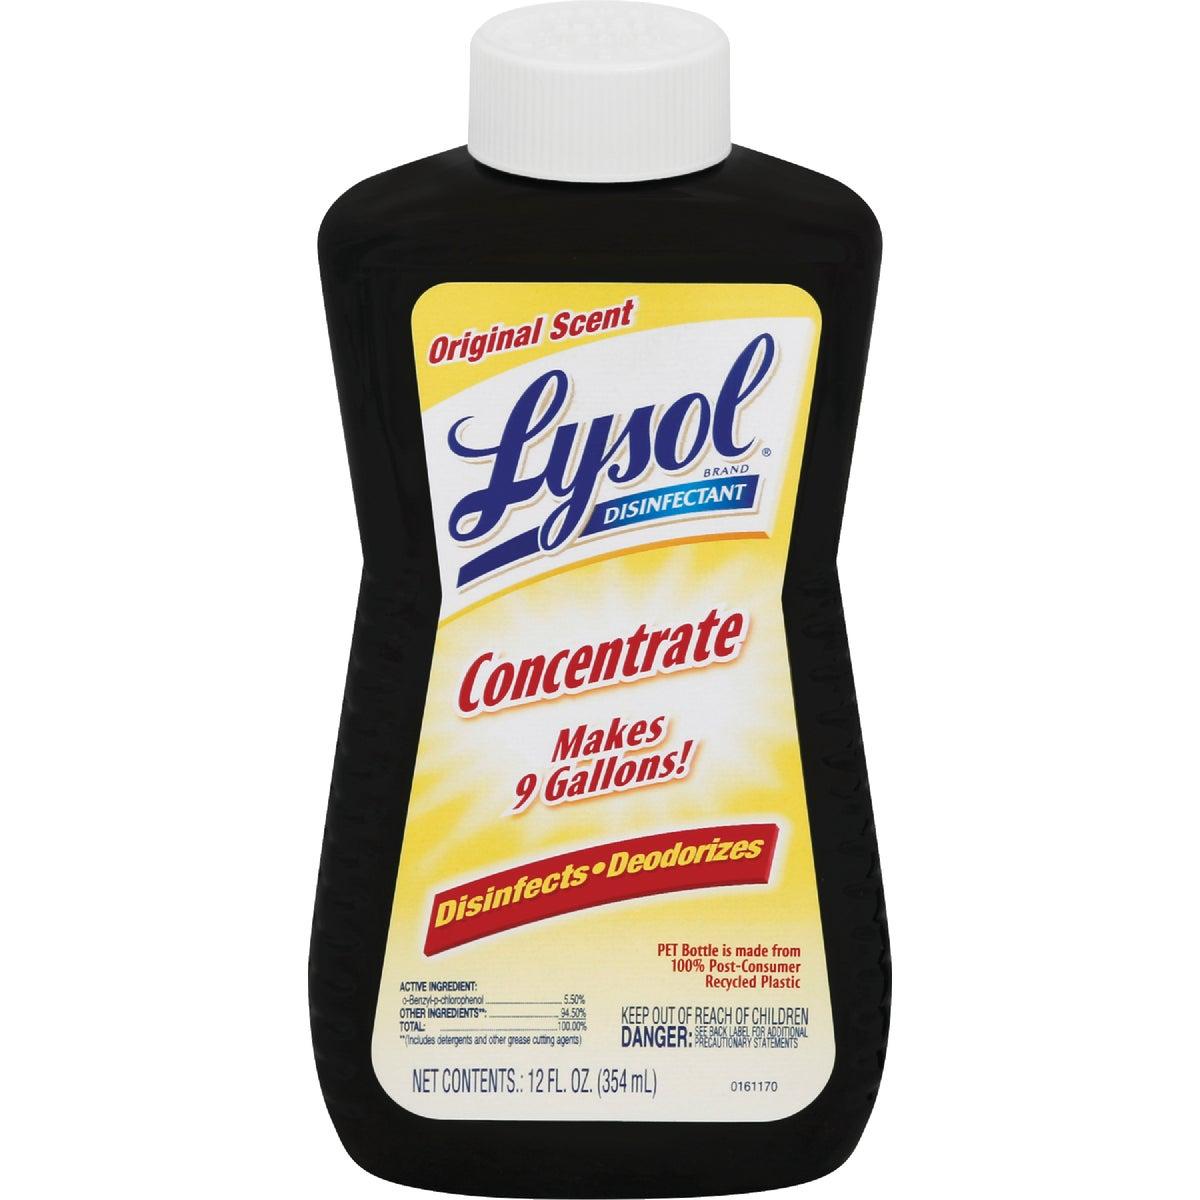 12Oz Concentrate Lysol